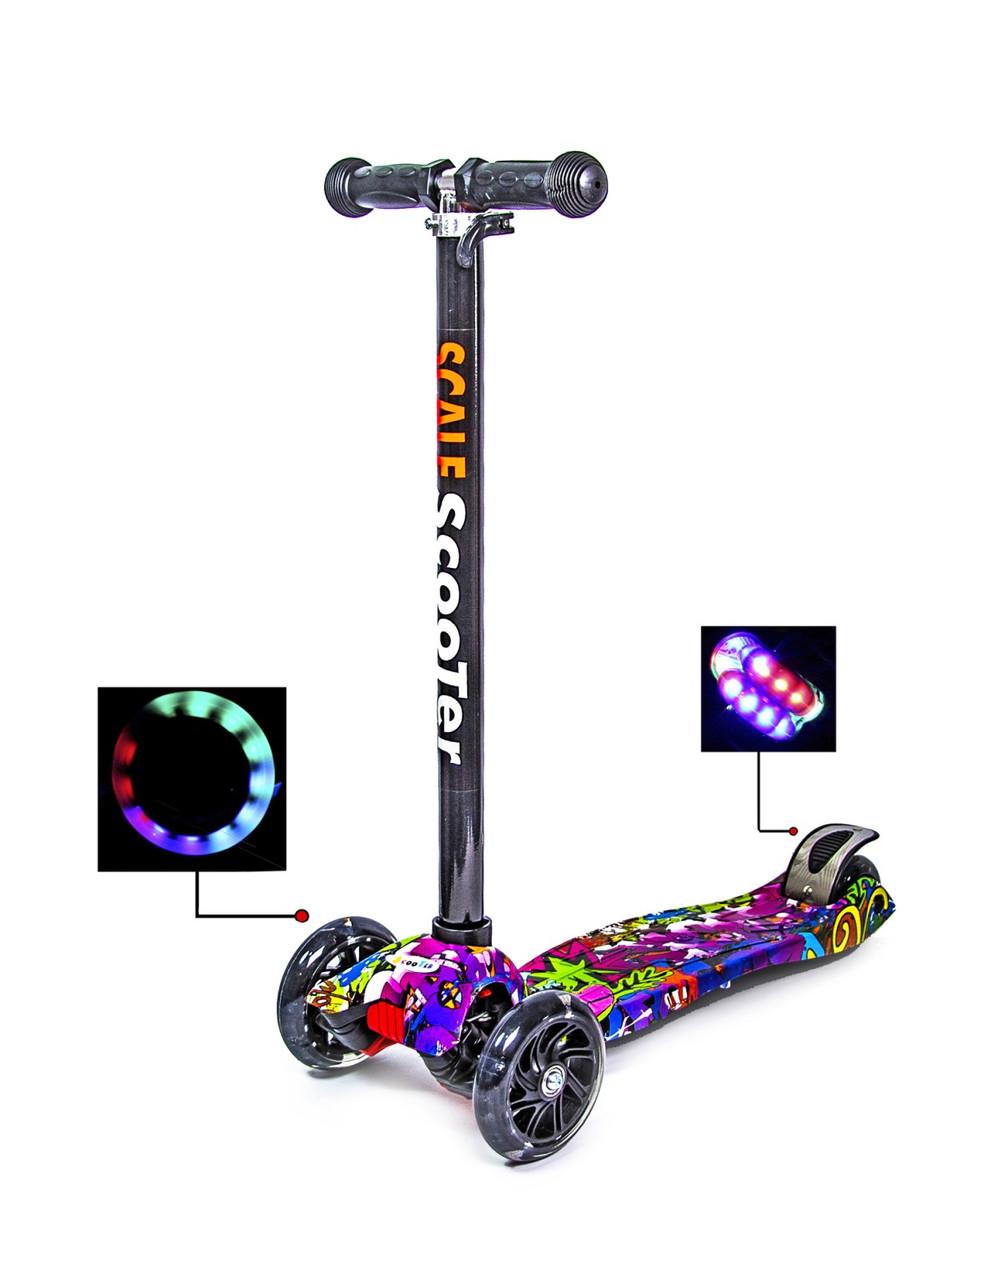 Детский самокат MAXI Scale ScooTer Graffiti Hip-Hop. Светящиеся колеса!